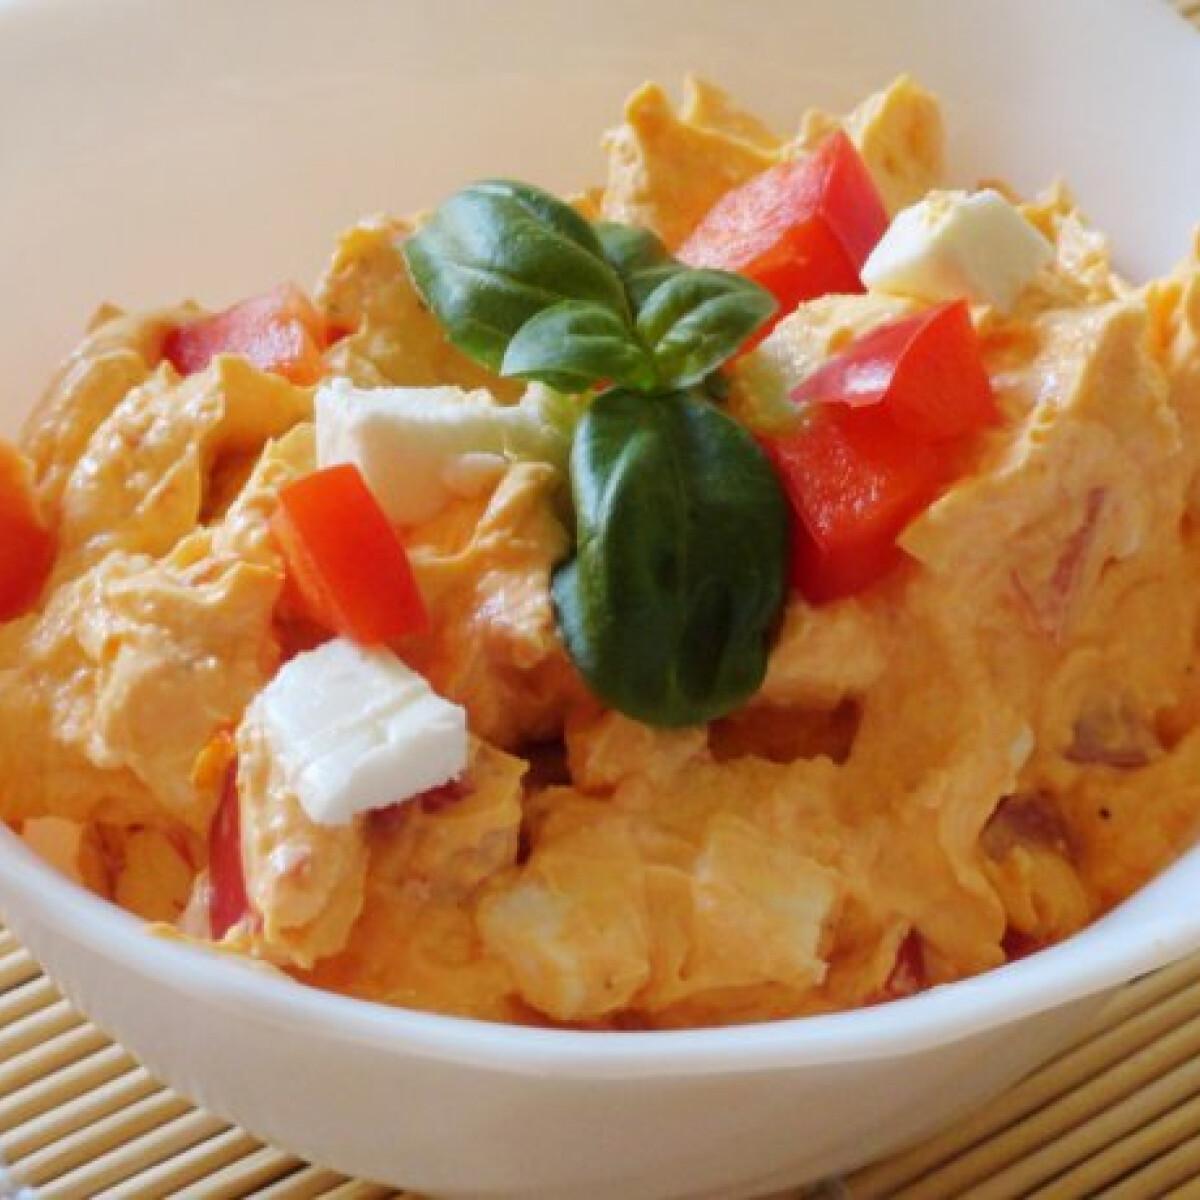 Ezen a képen: Paprikás krémsajt fetával